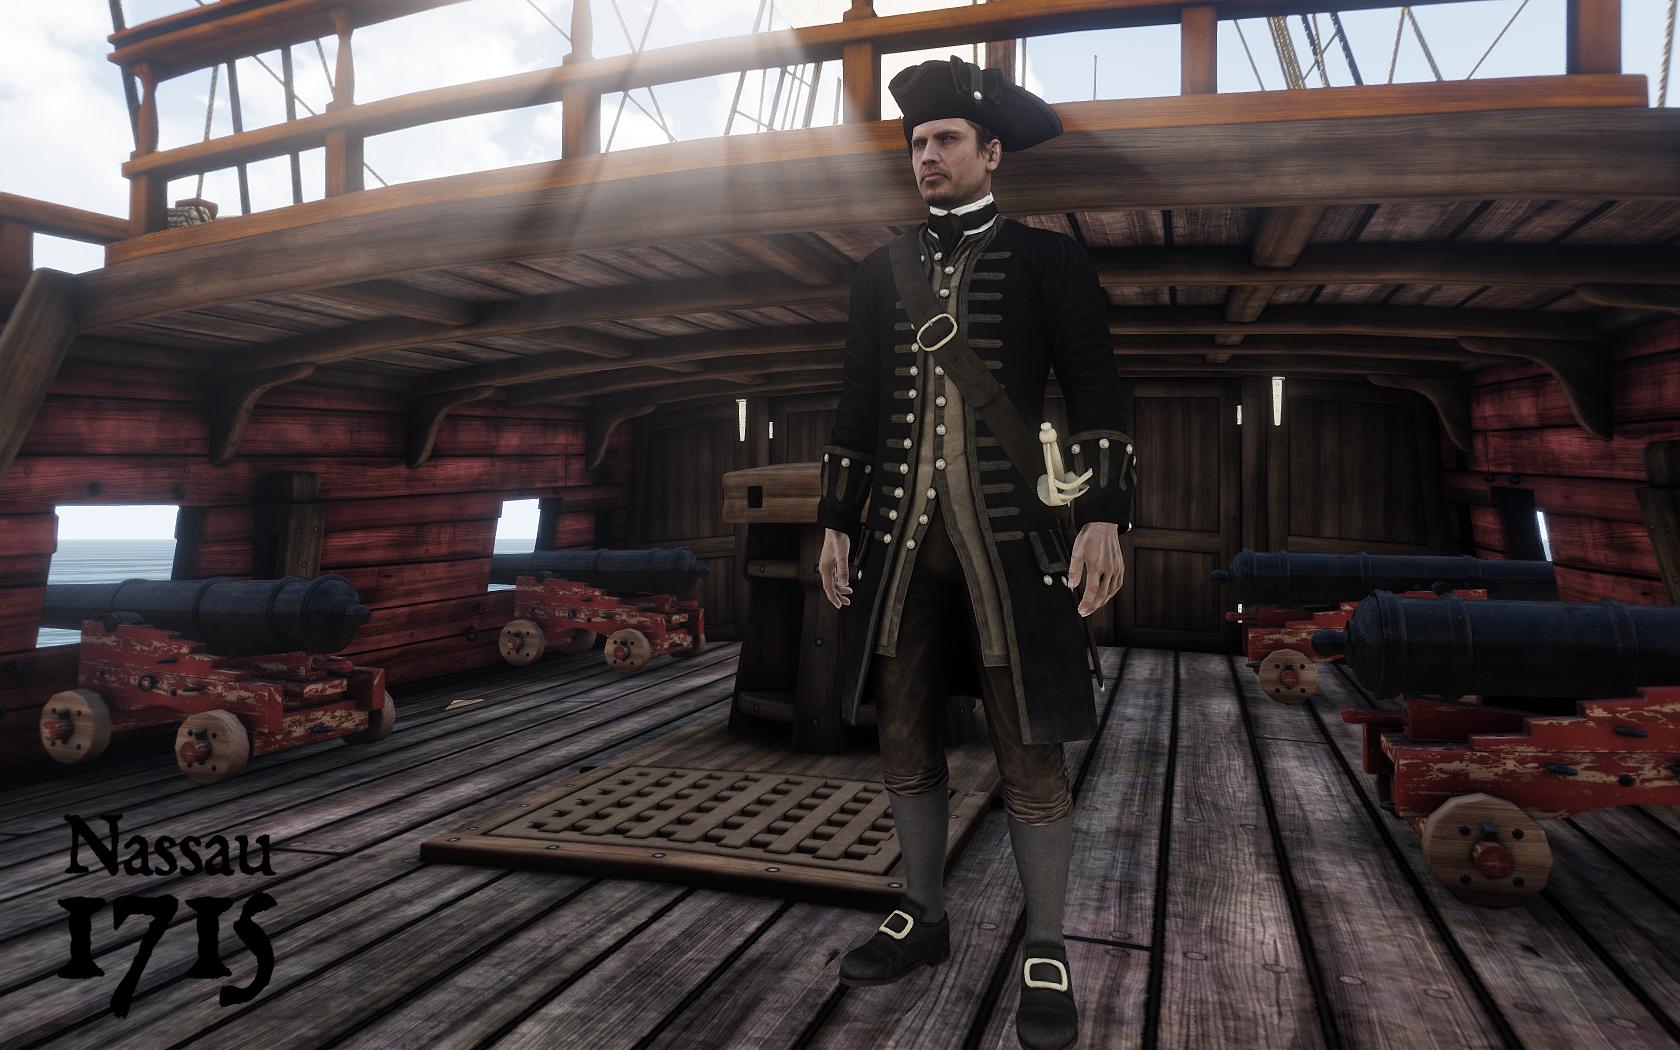 Nassau 1715 - Arma 3 mod | PiratesAhoy!